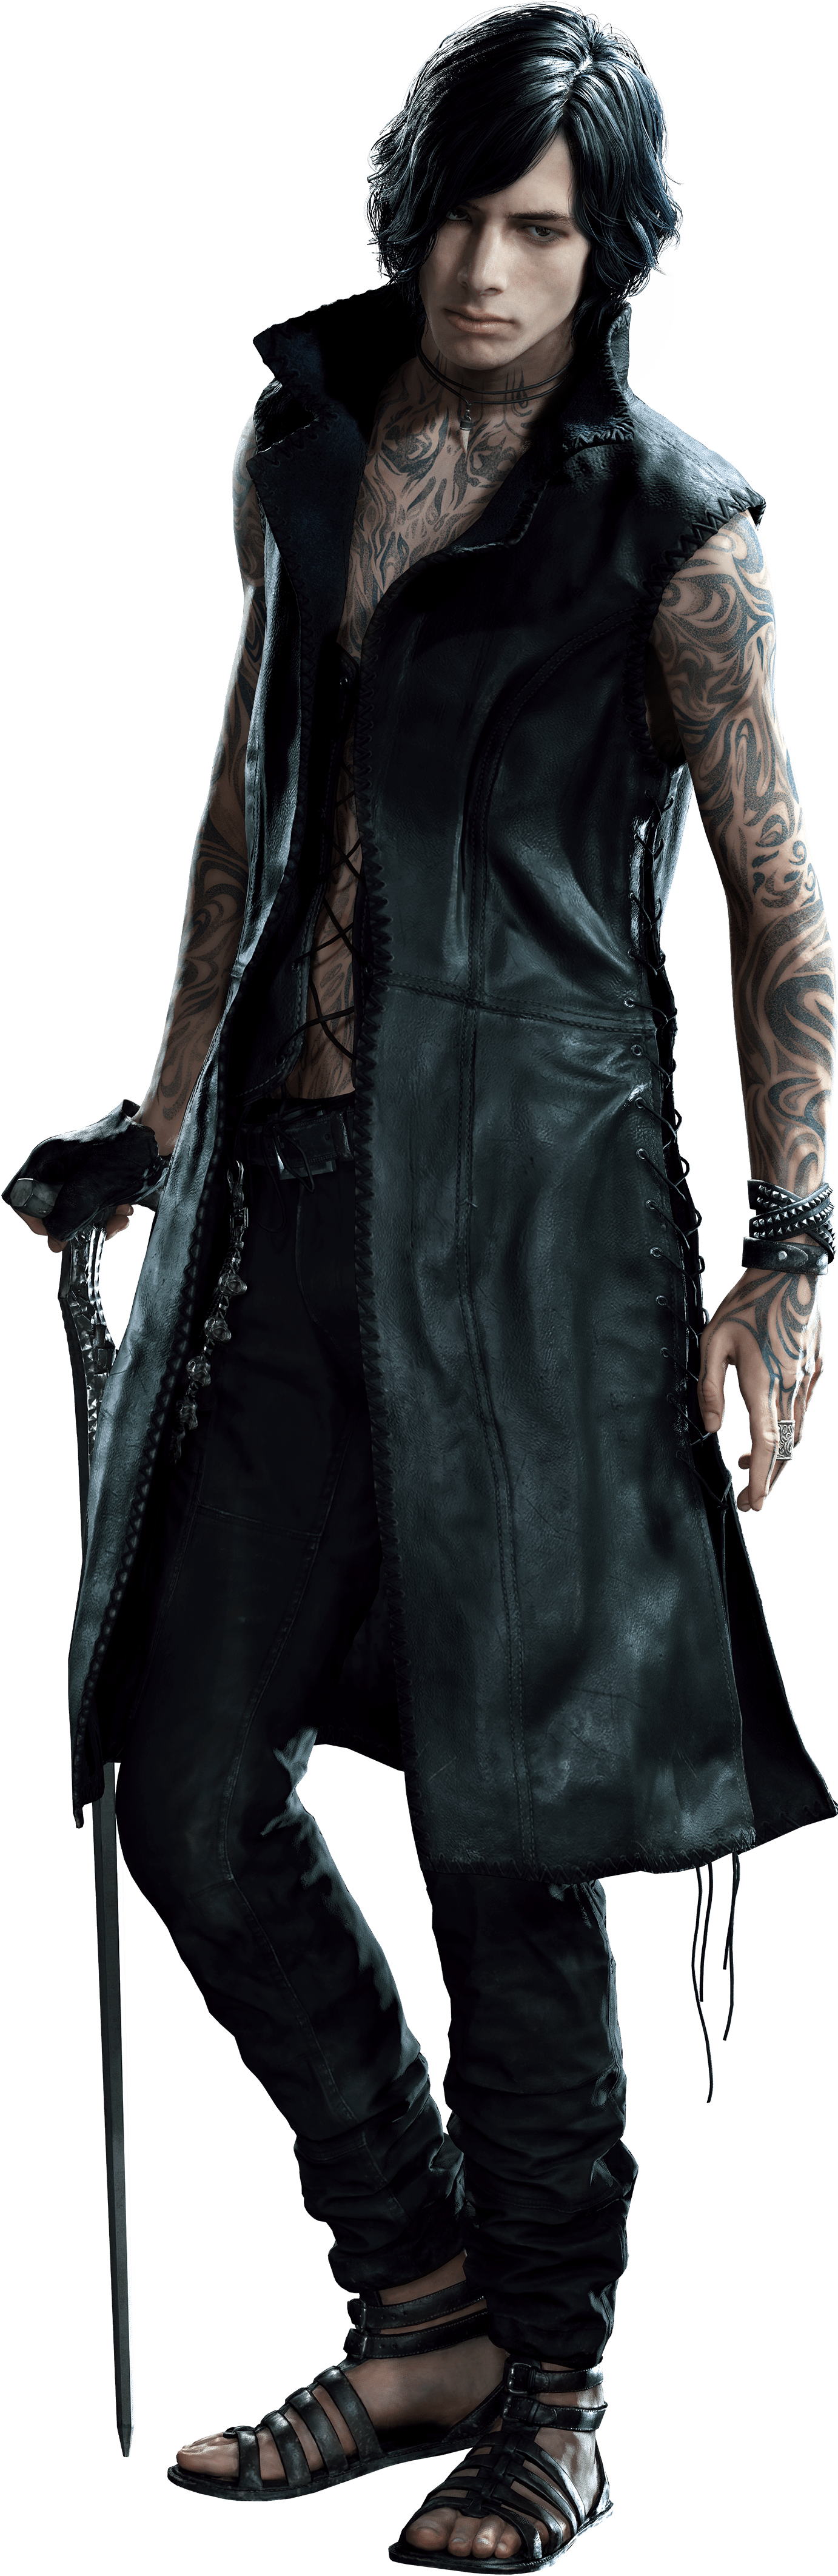 V | Devil May Cry Wiki | FANDOM powered by Wikia